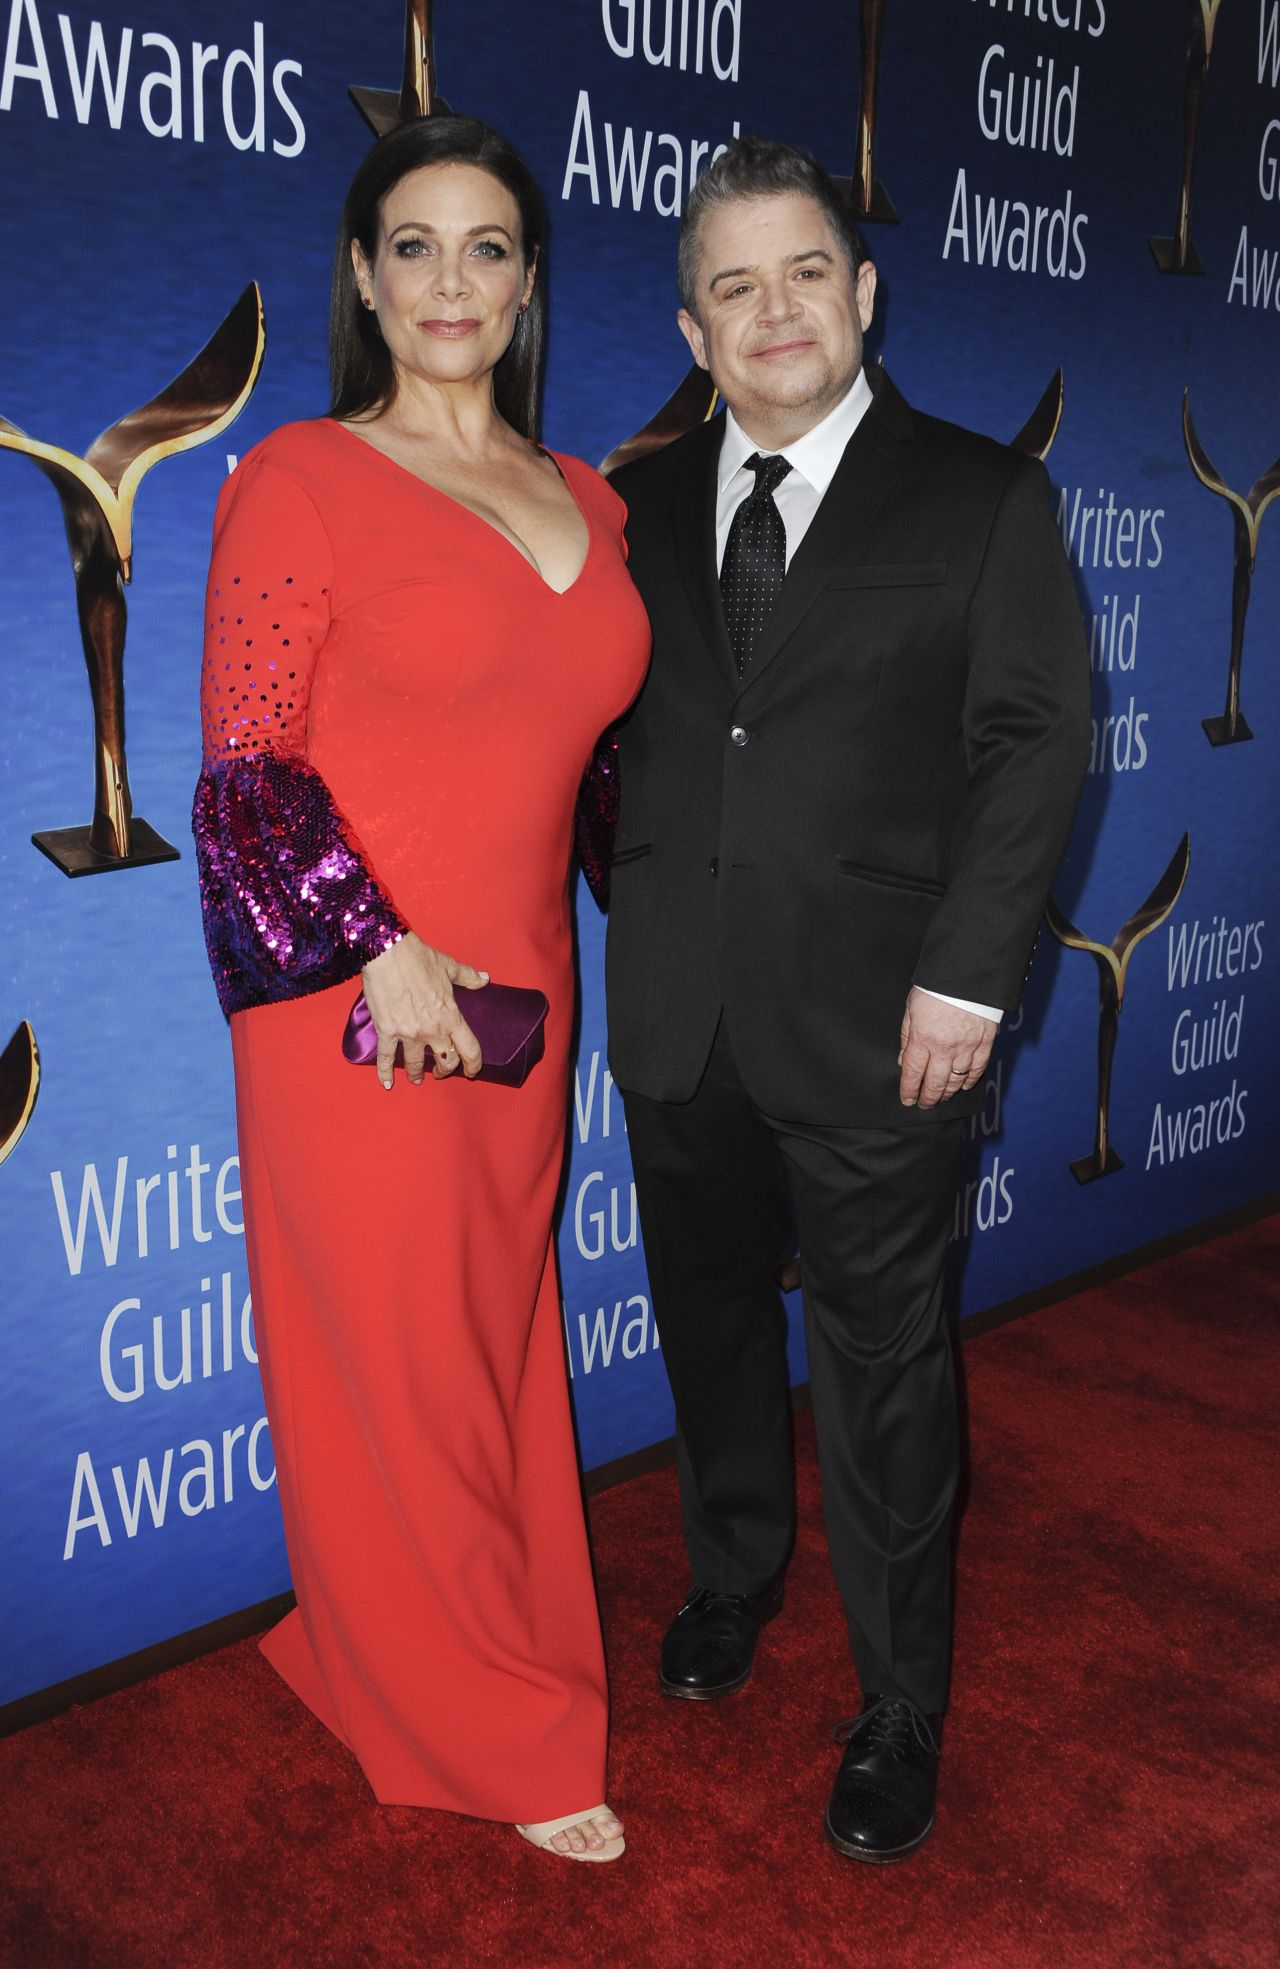 Meredith Salenger Writers Guild Awards 2018 Red Carpet